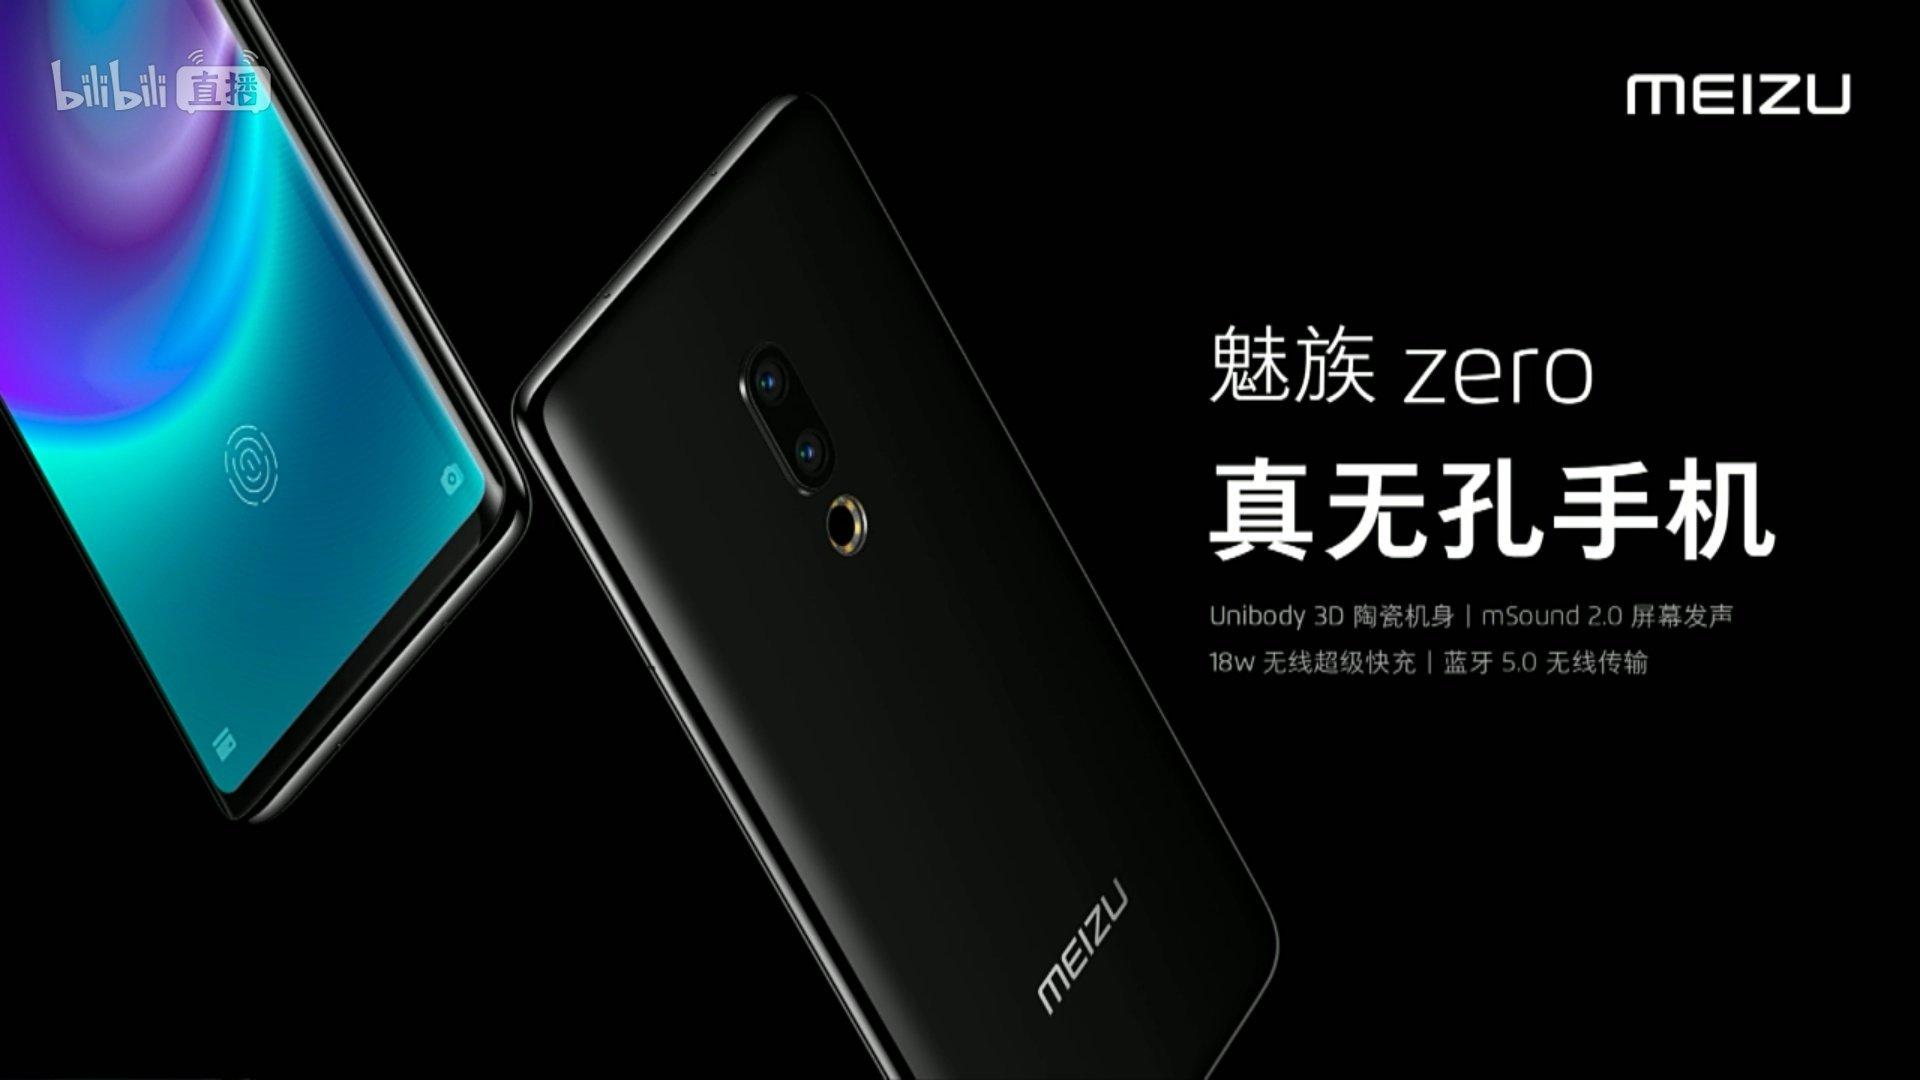 Meizu Zero The True Portless Phone